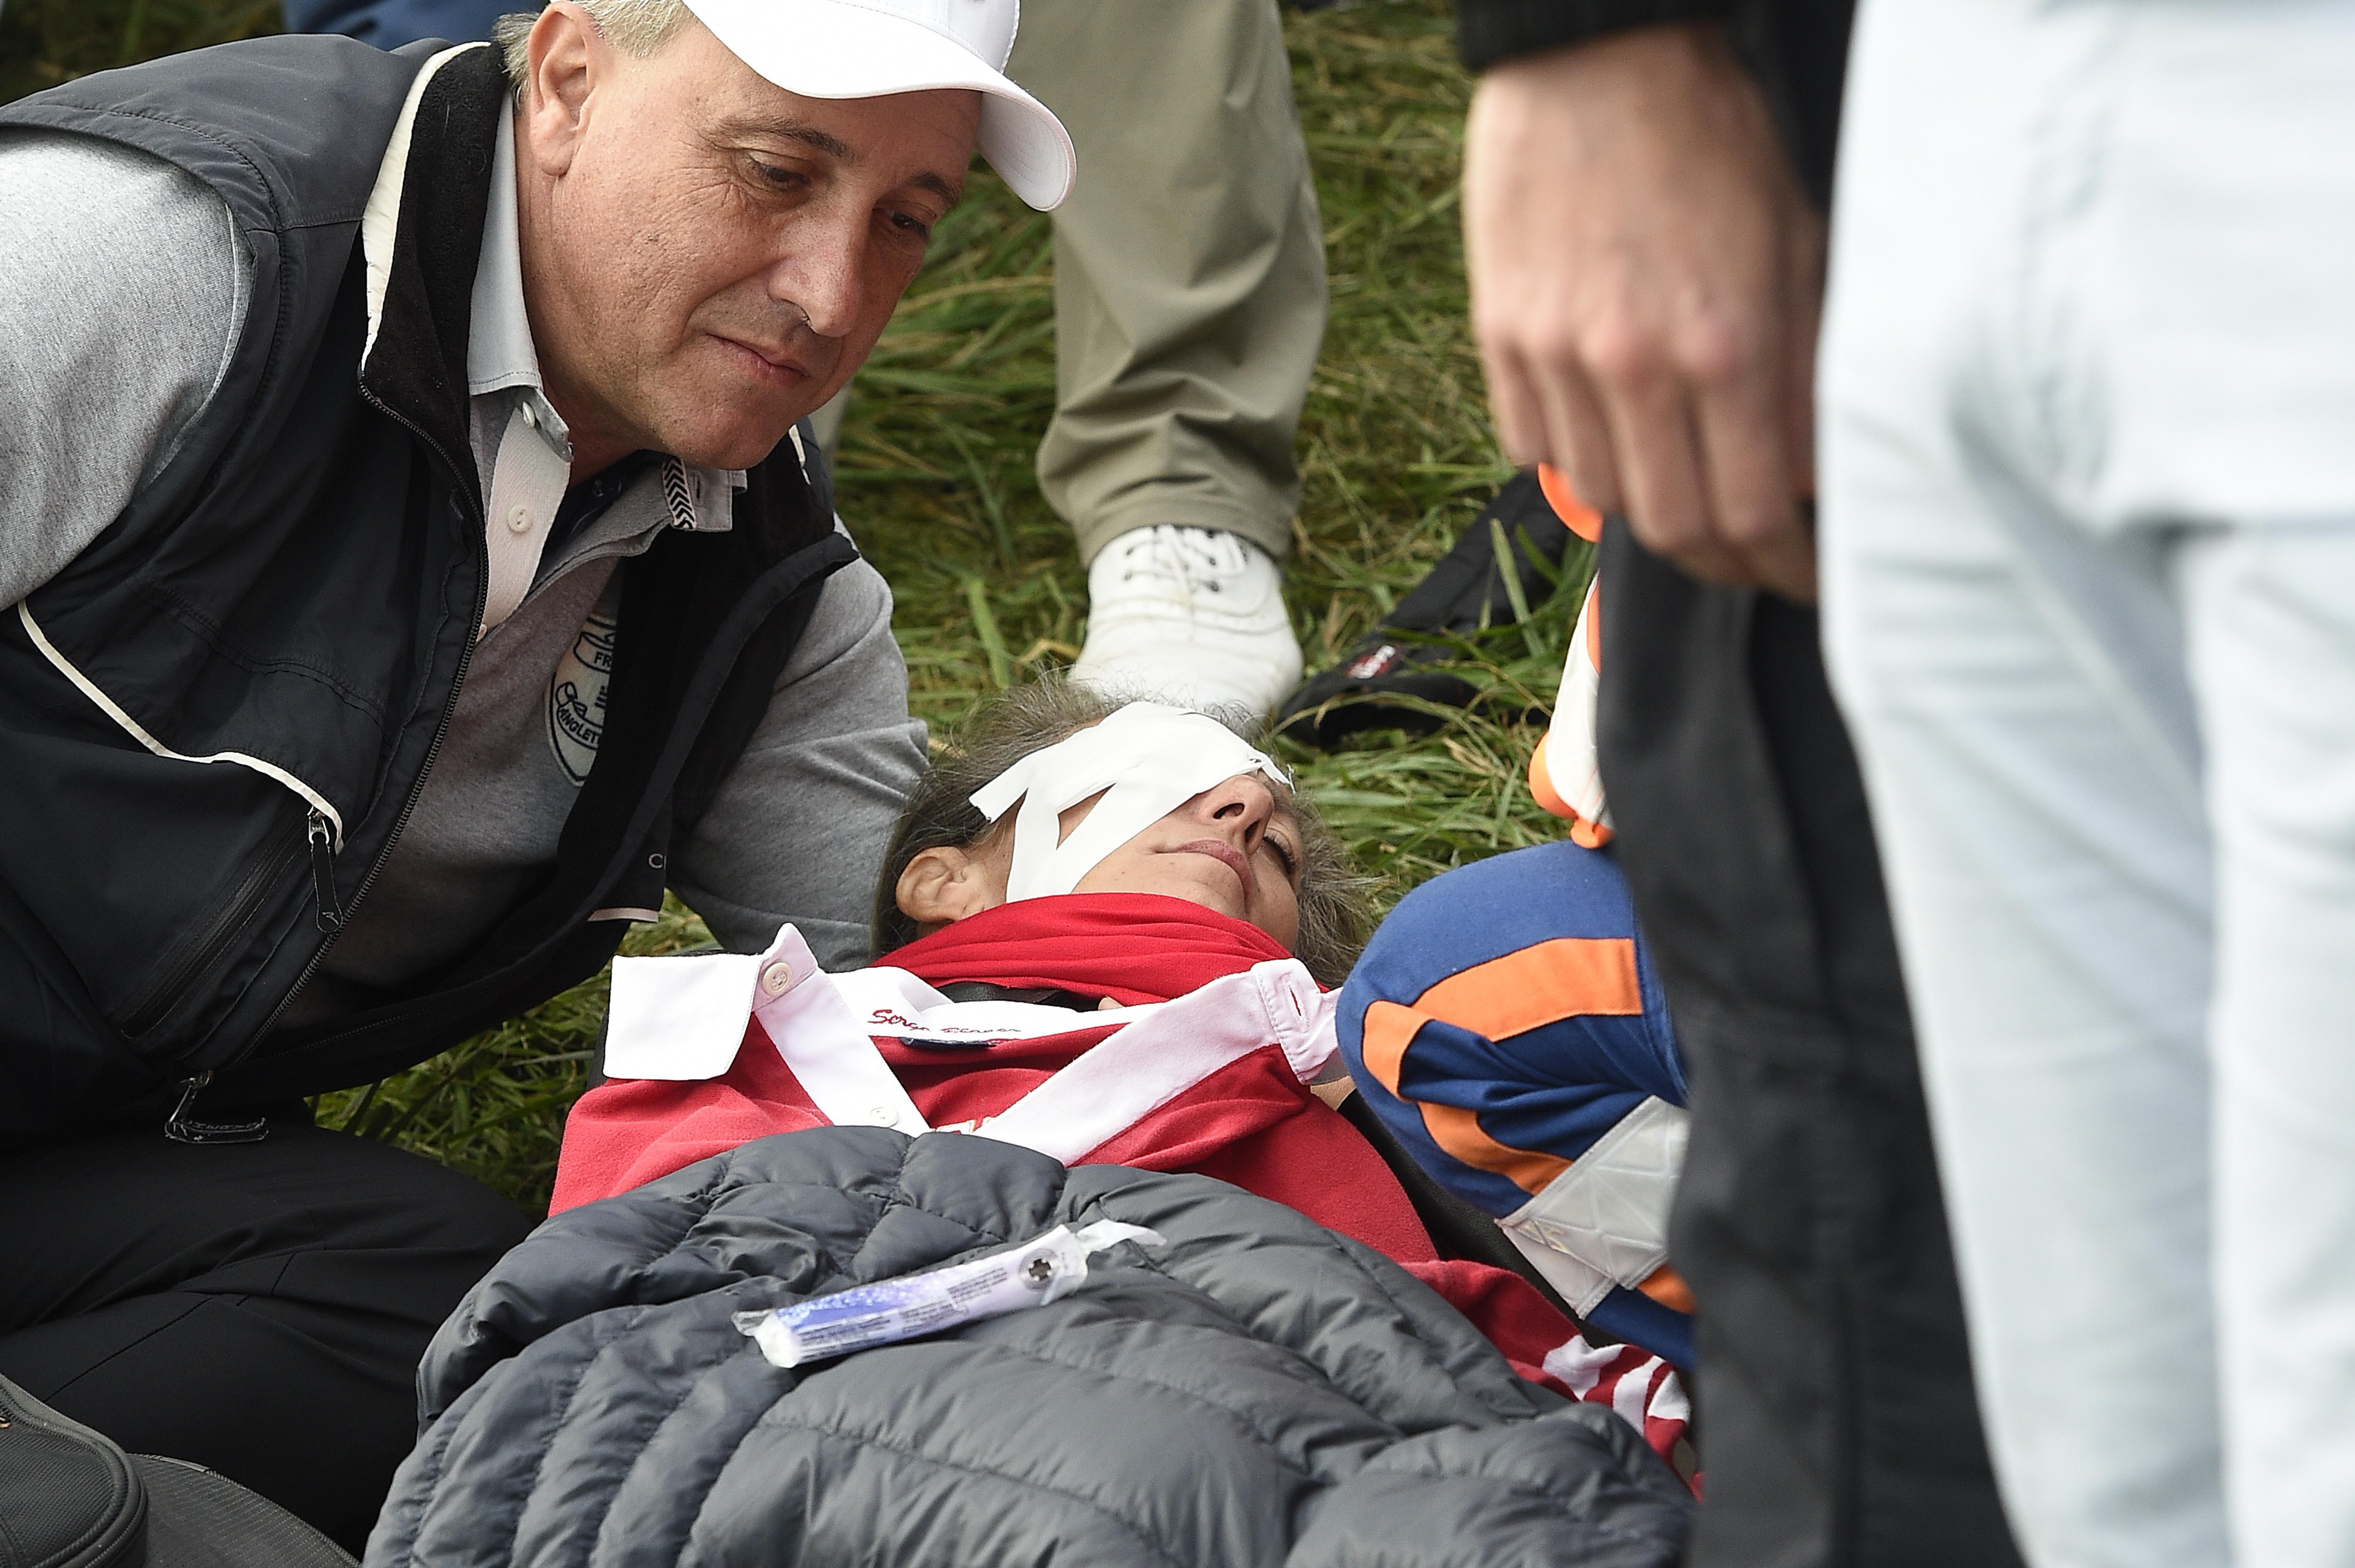 Remande, 49, was struck by a wayward tee shot from American golfer Brooks Koepka